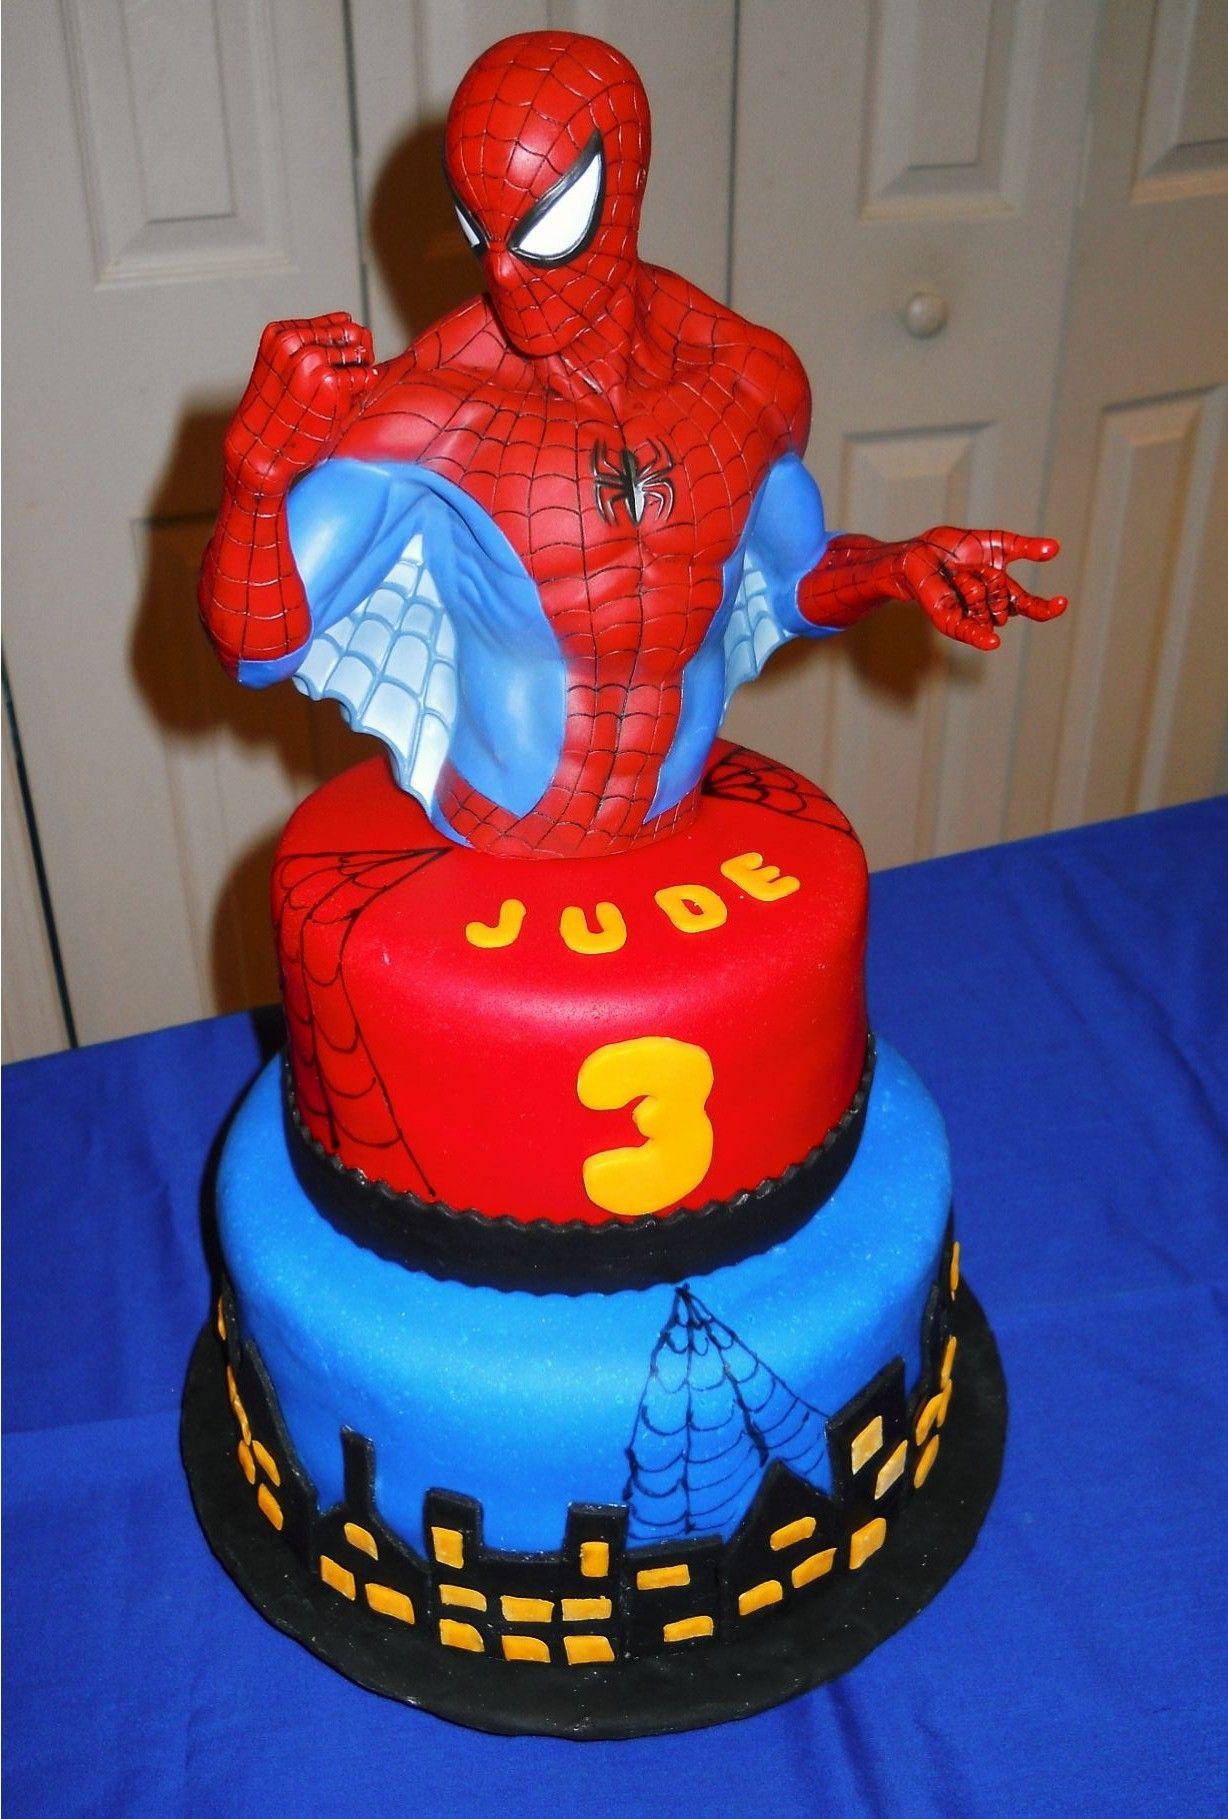 Amazing Birthday Cakes For Boys | www.imgkid.com - The ...